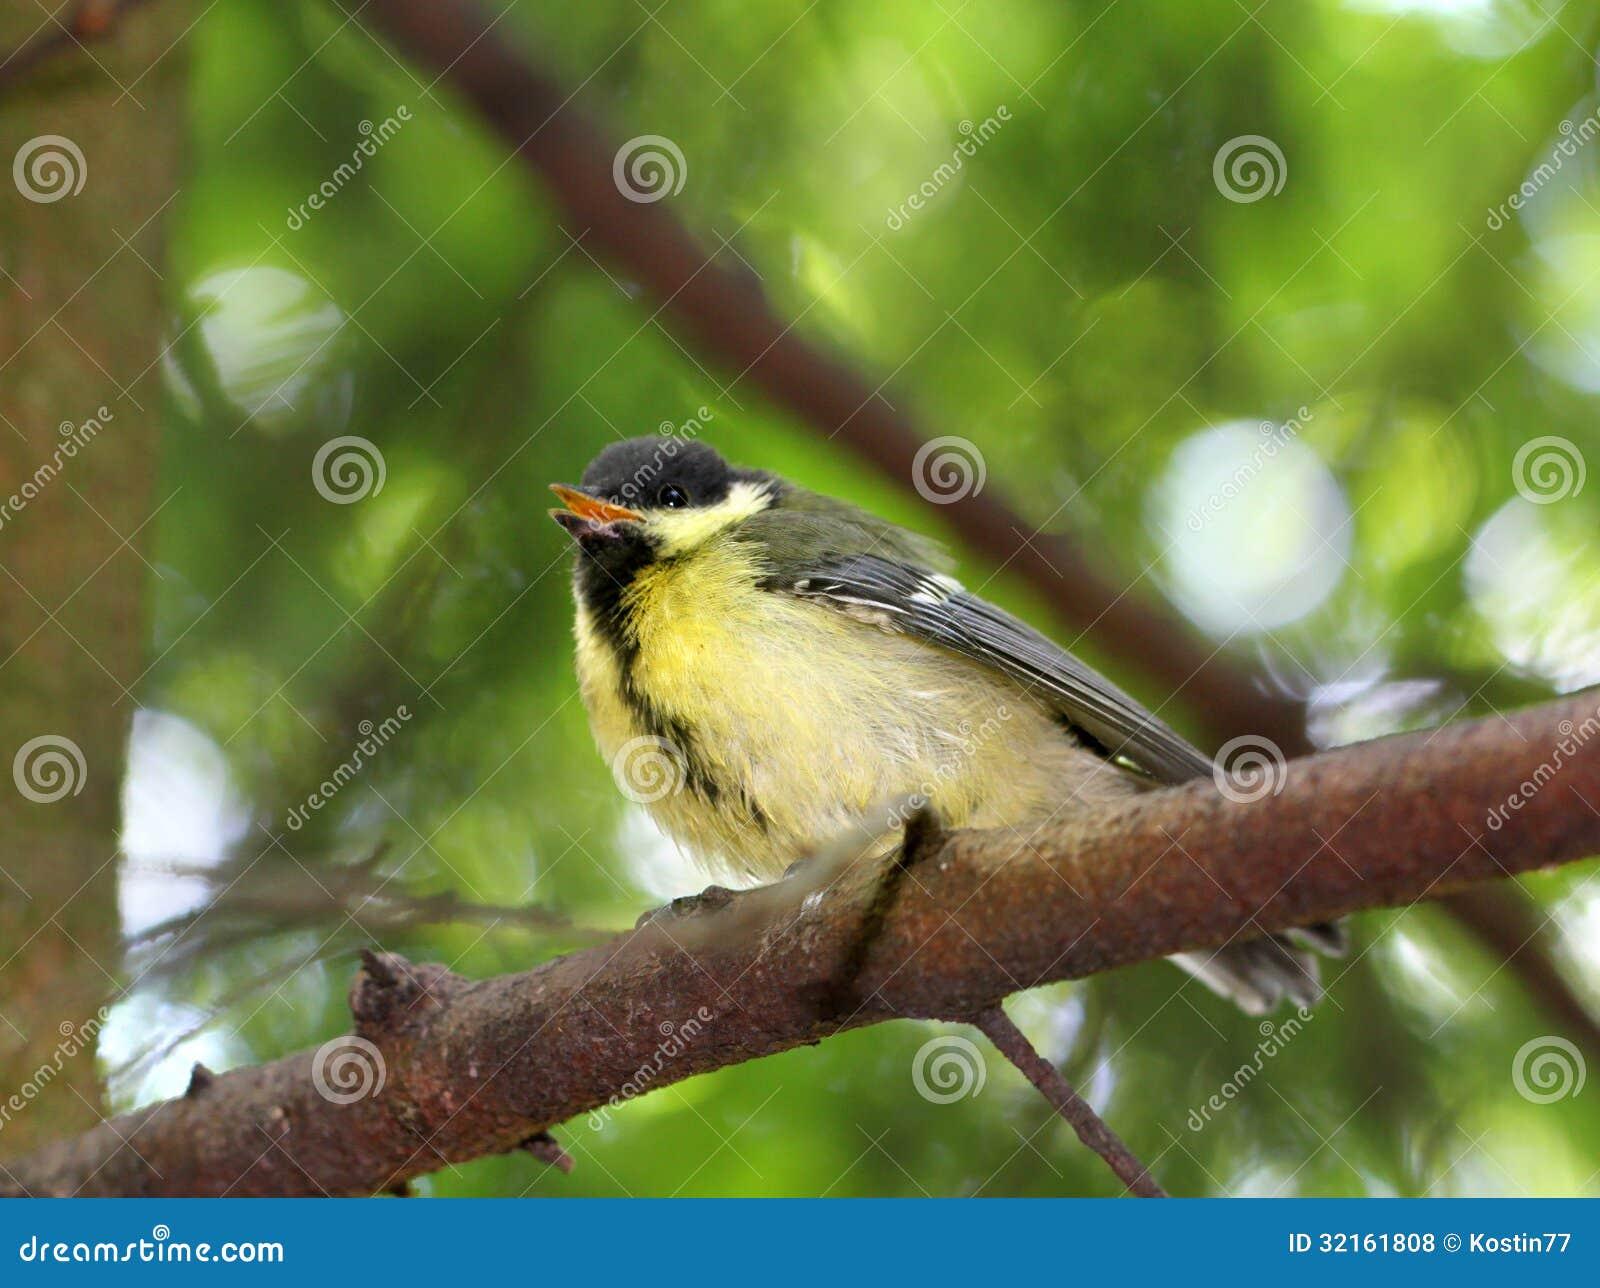 Fledgling Birds Titmouse Stock Photo Image Of Bole, Soft - 32161808-7877